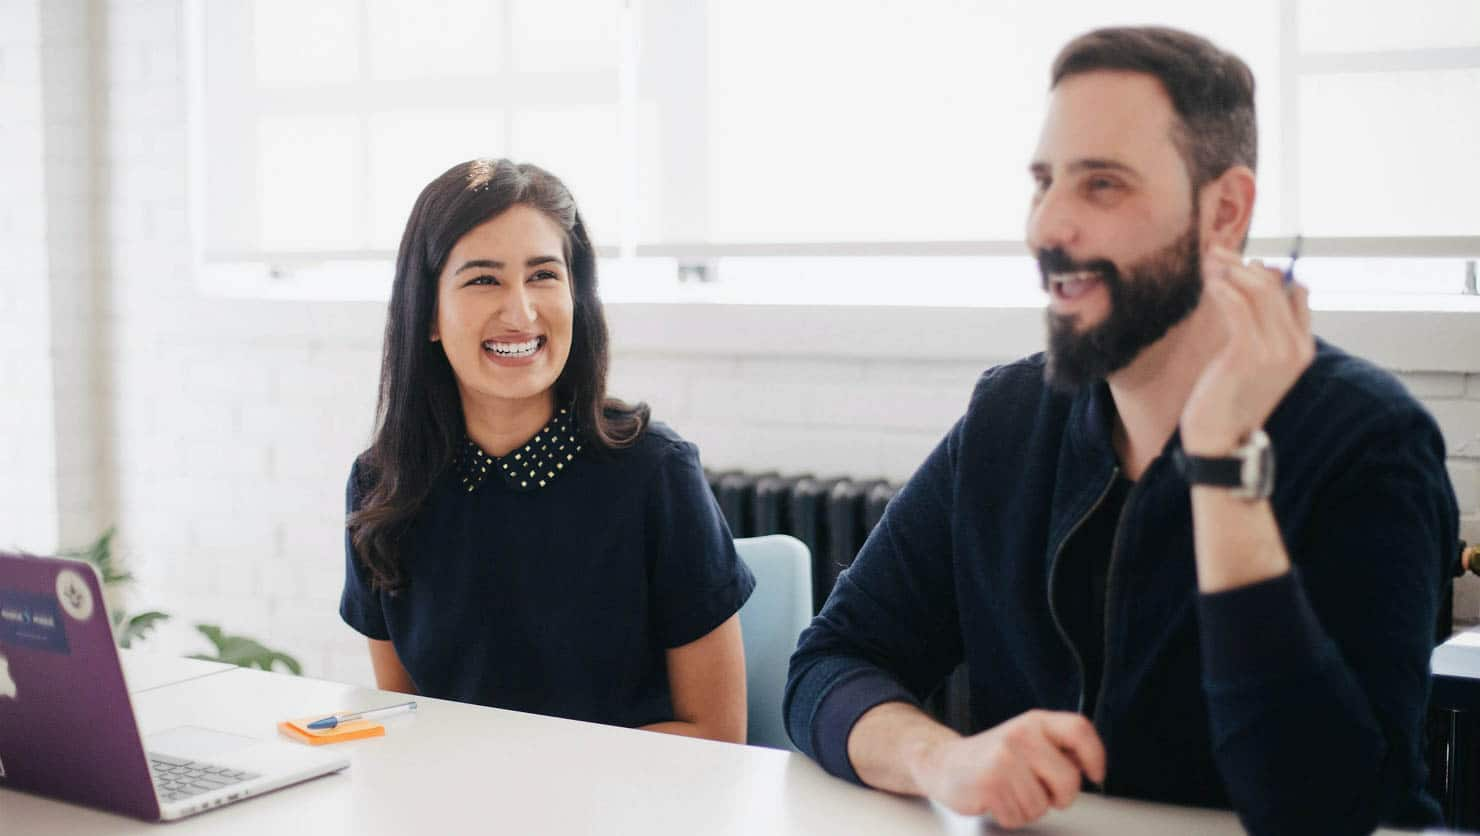 Woman and man smiling at meeting